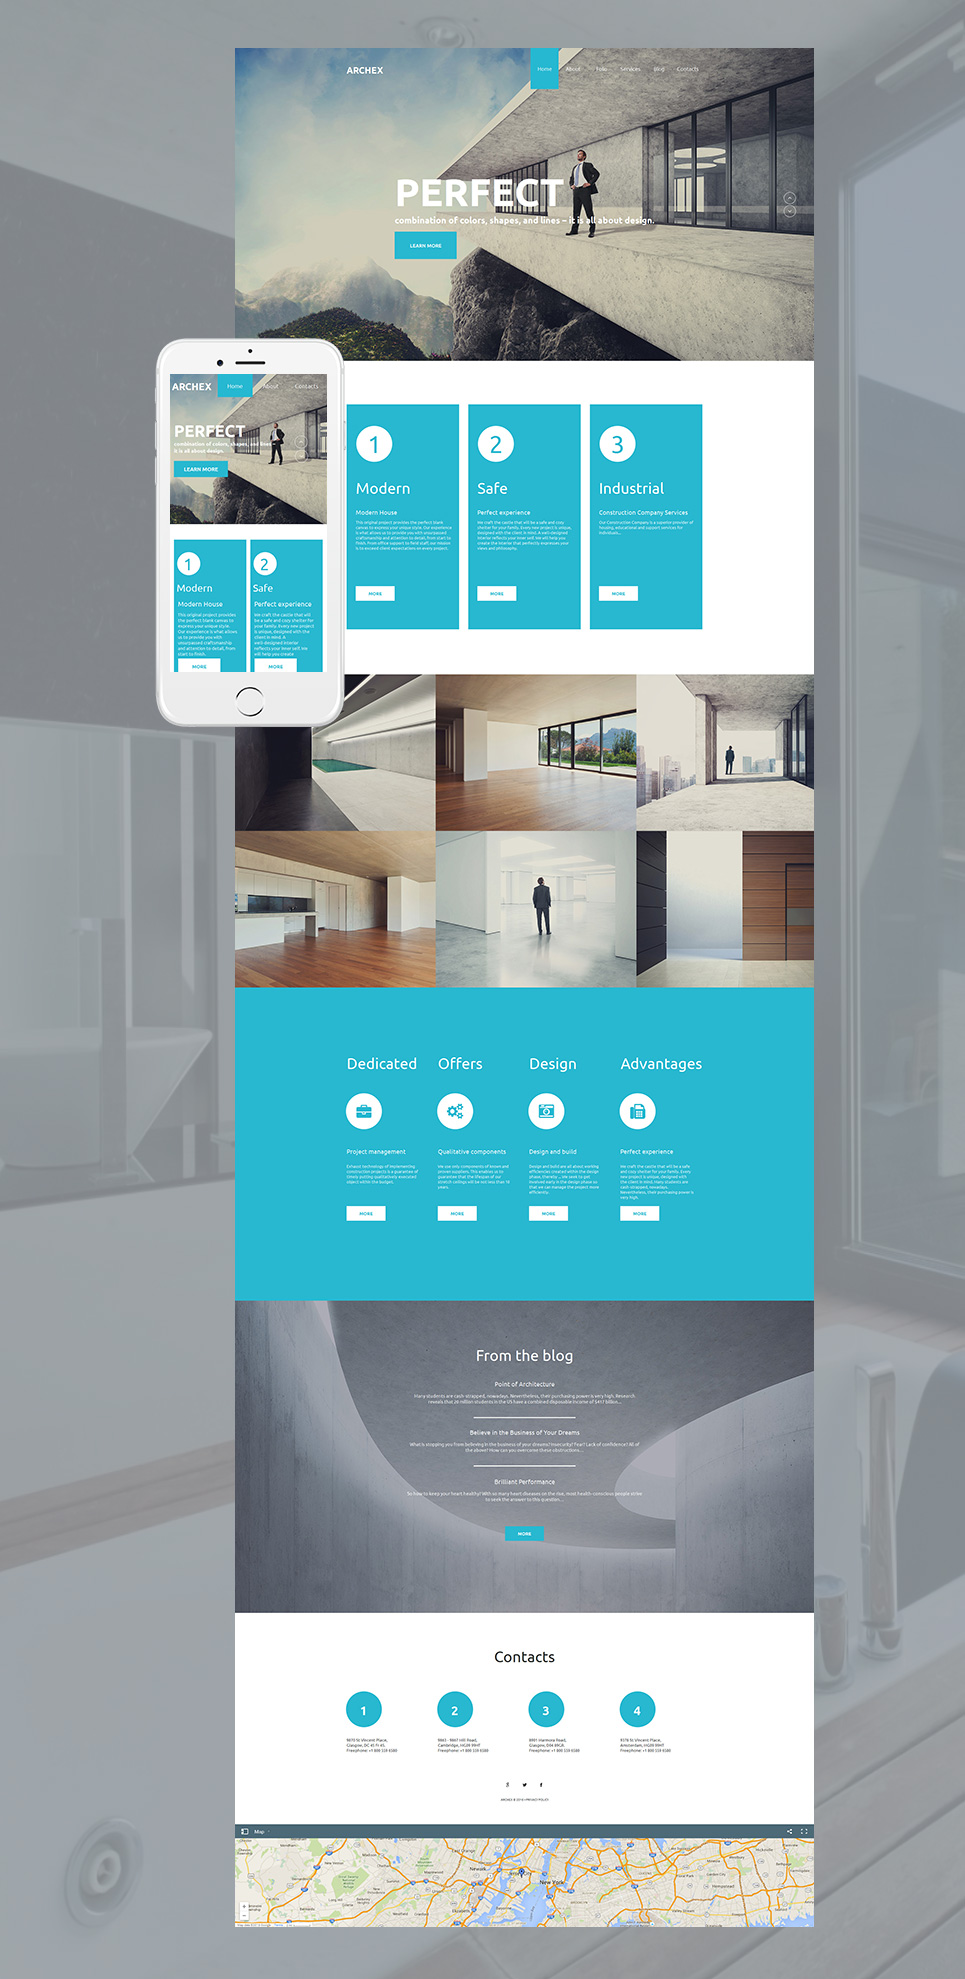 MotoCMS HTML Vorlage #58473 aus der Kategorie Architektur - image